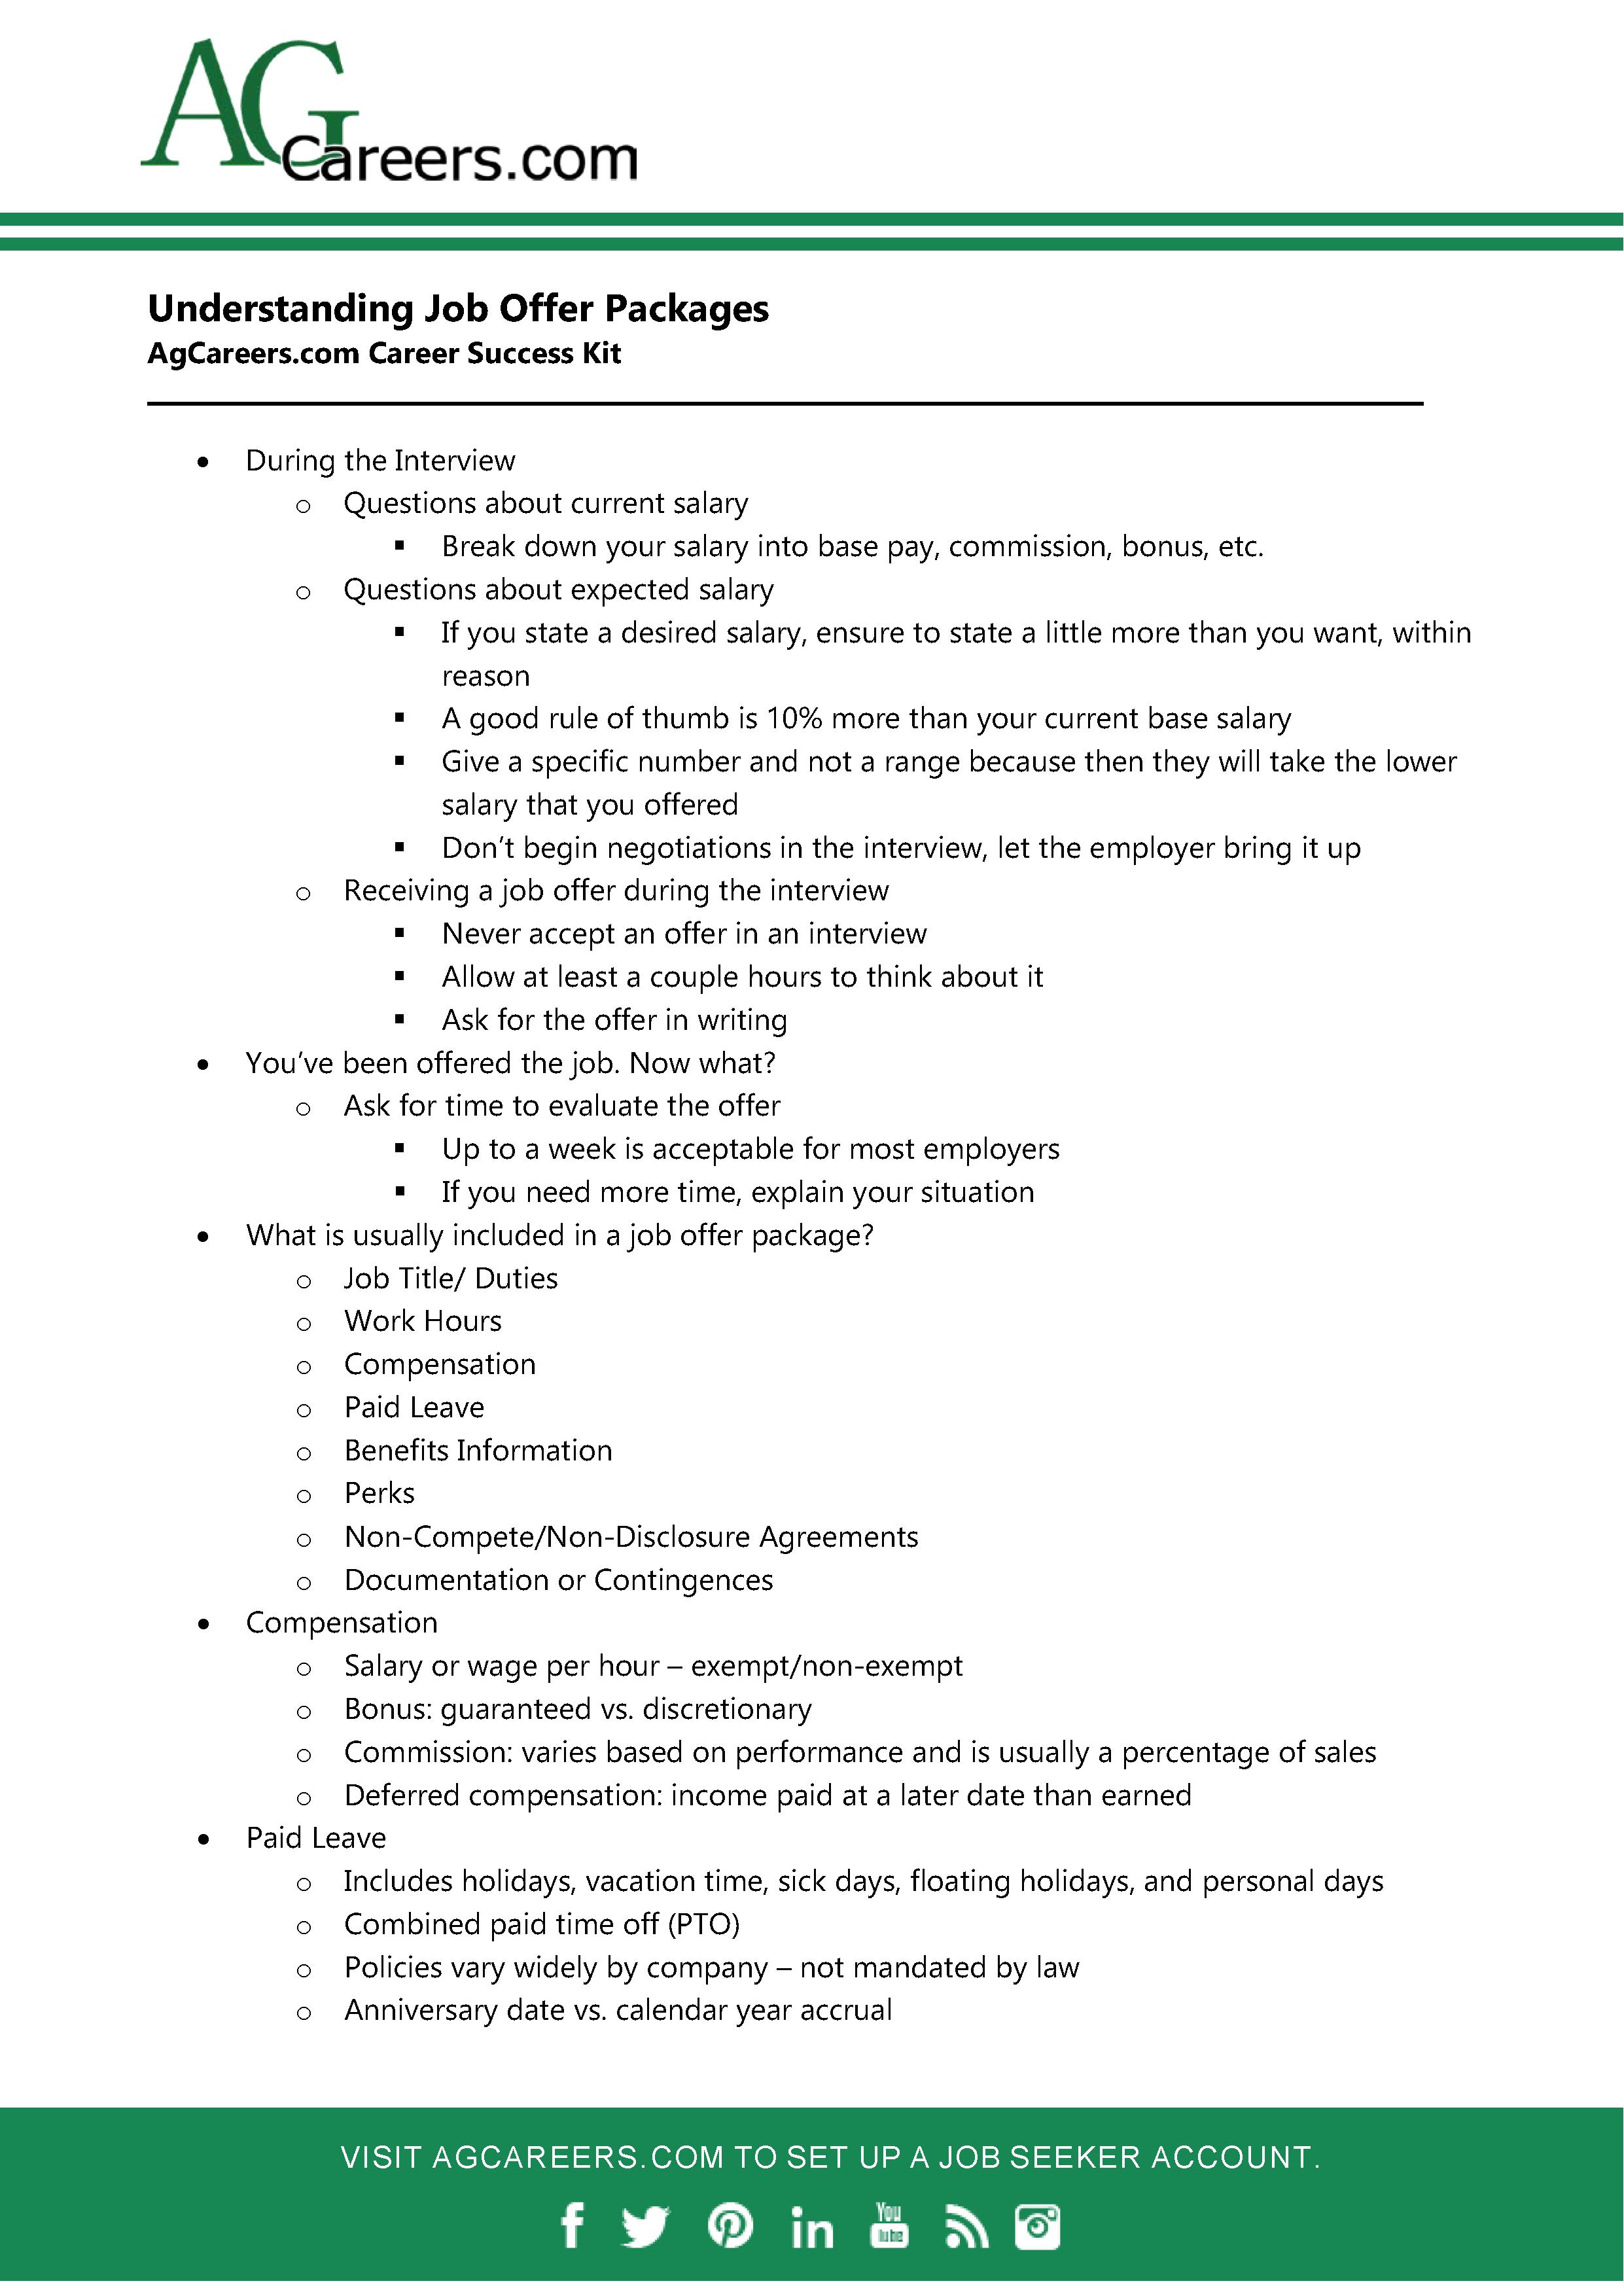 Careers.com Career Success Kit: Understanding the Job Offer Package